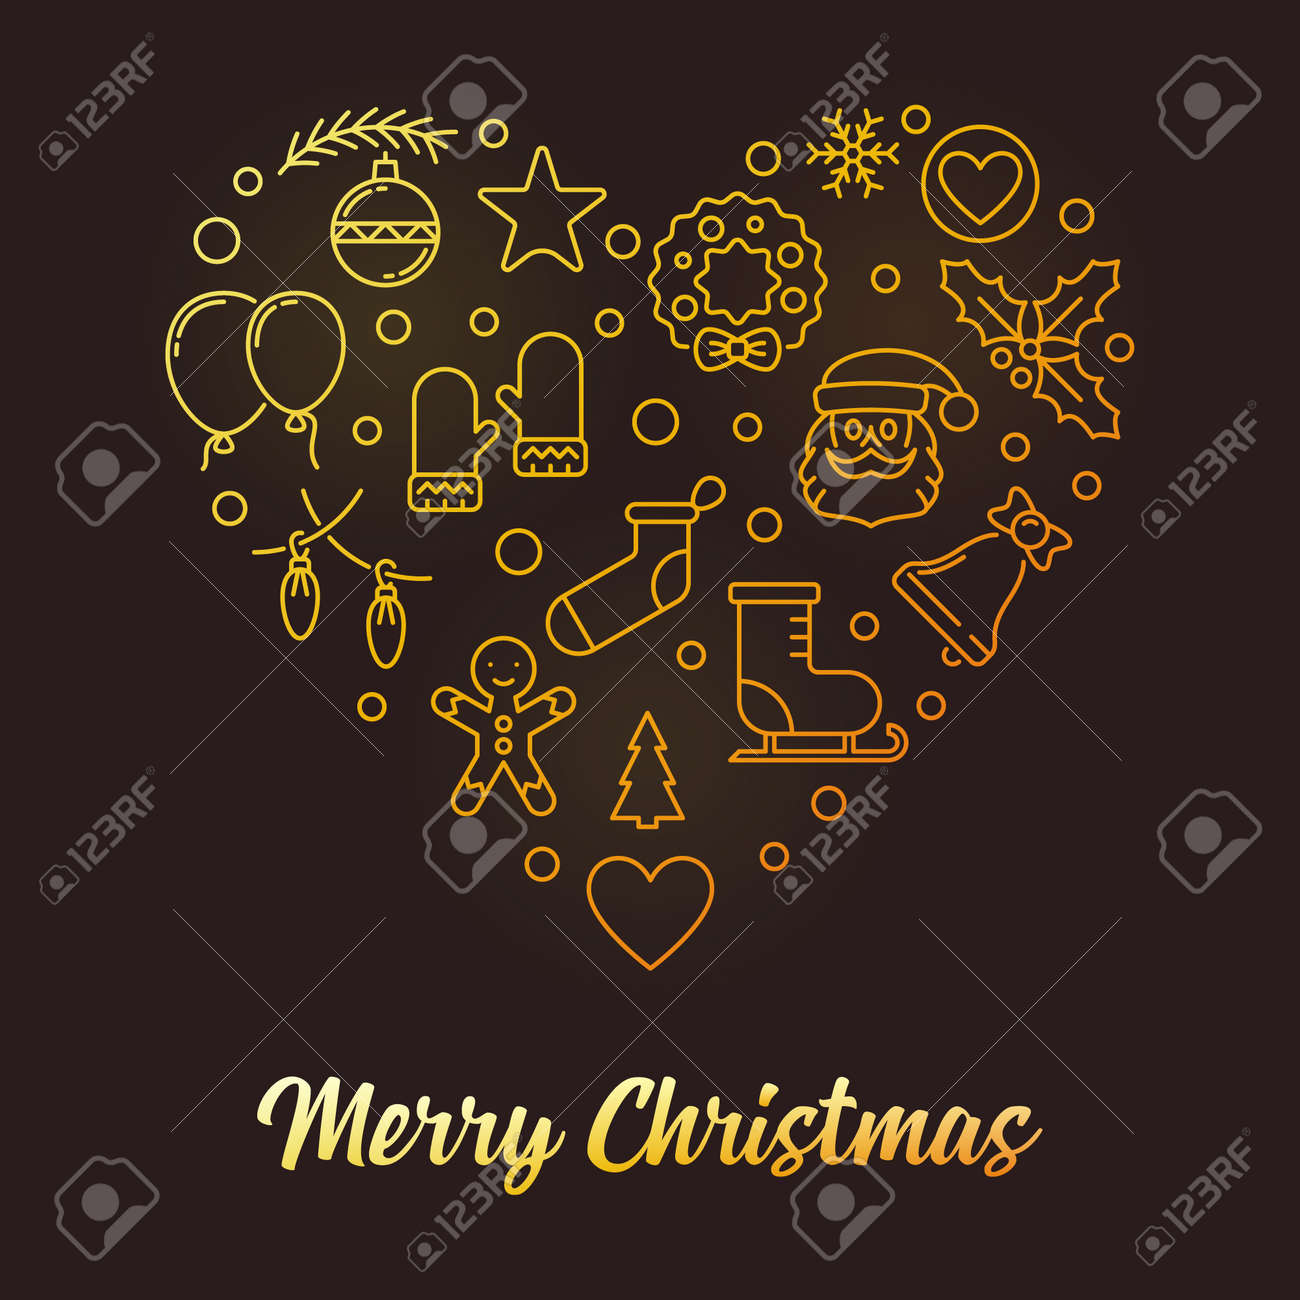 Christmas Heart Vector.Merry Christmas Heart Vector Golden Xmas Illustration In Outline